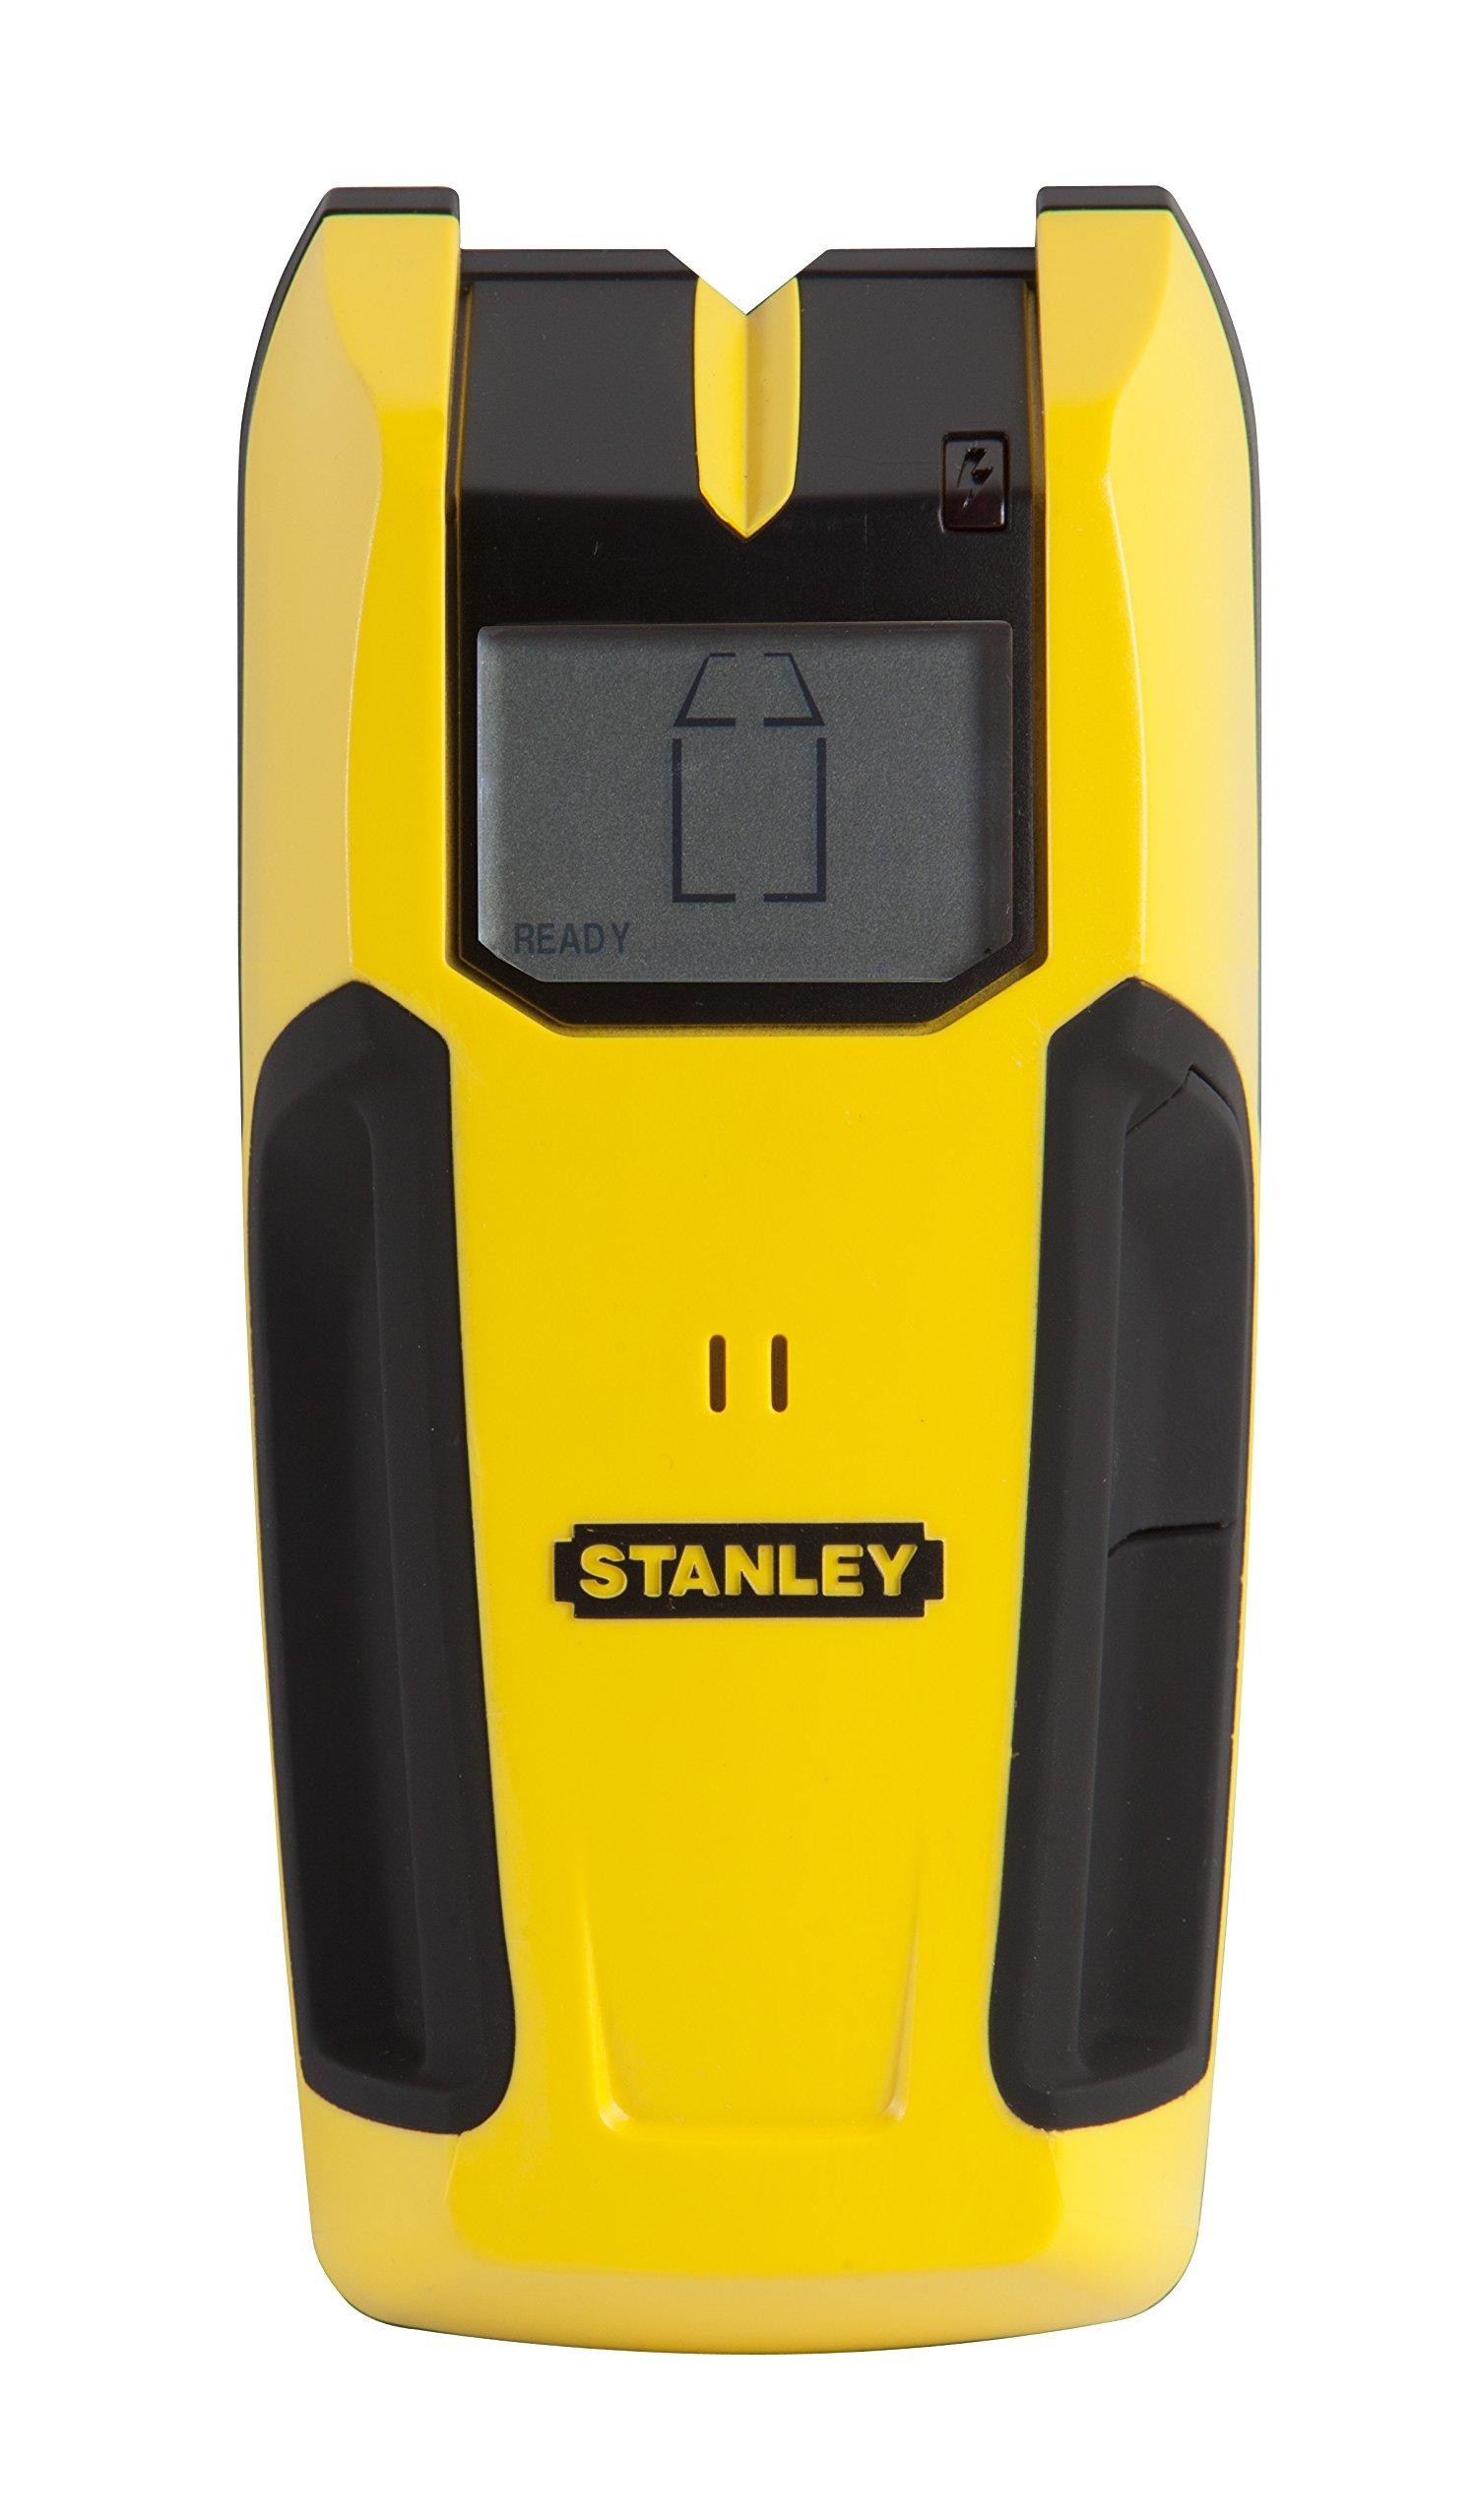 Stanley STHT0-77406 S200 Stud Sensor, Yellow/Black